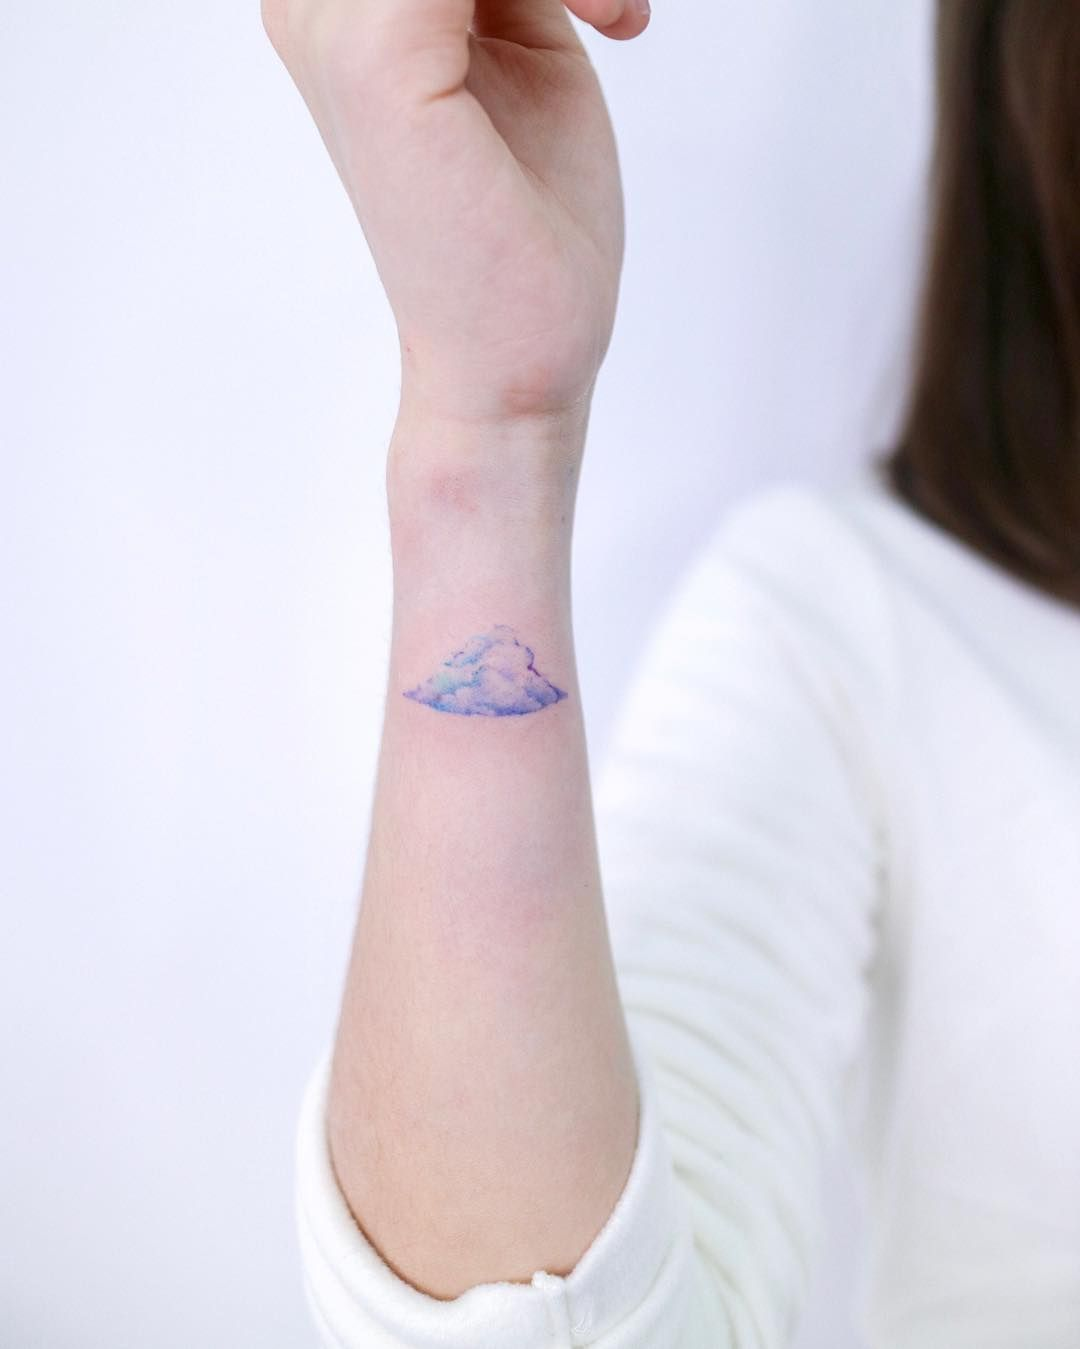 60 Unique Small Watercolor Tattoos For Women Millions Grace In 2020 Tiny Wrist Tattoos Tattoos For Women Small Wrist Tattoos